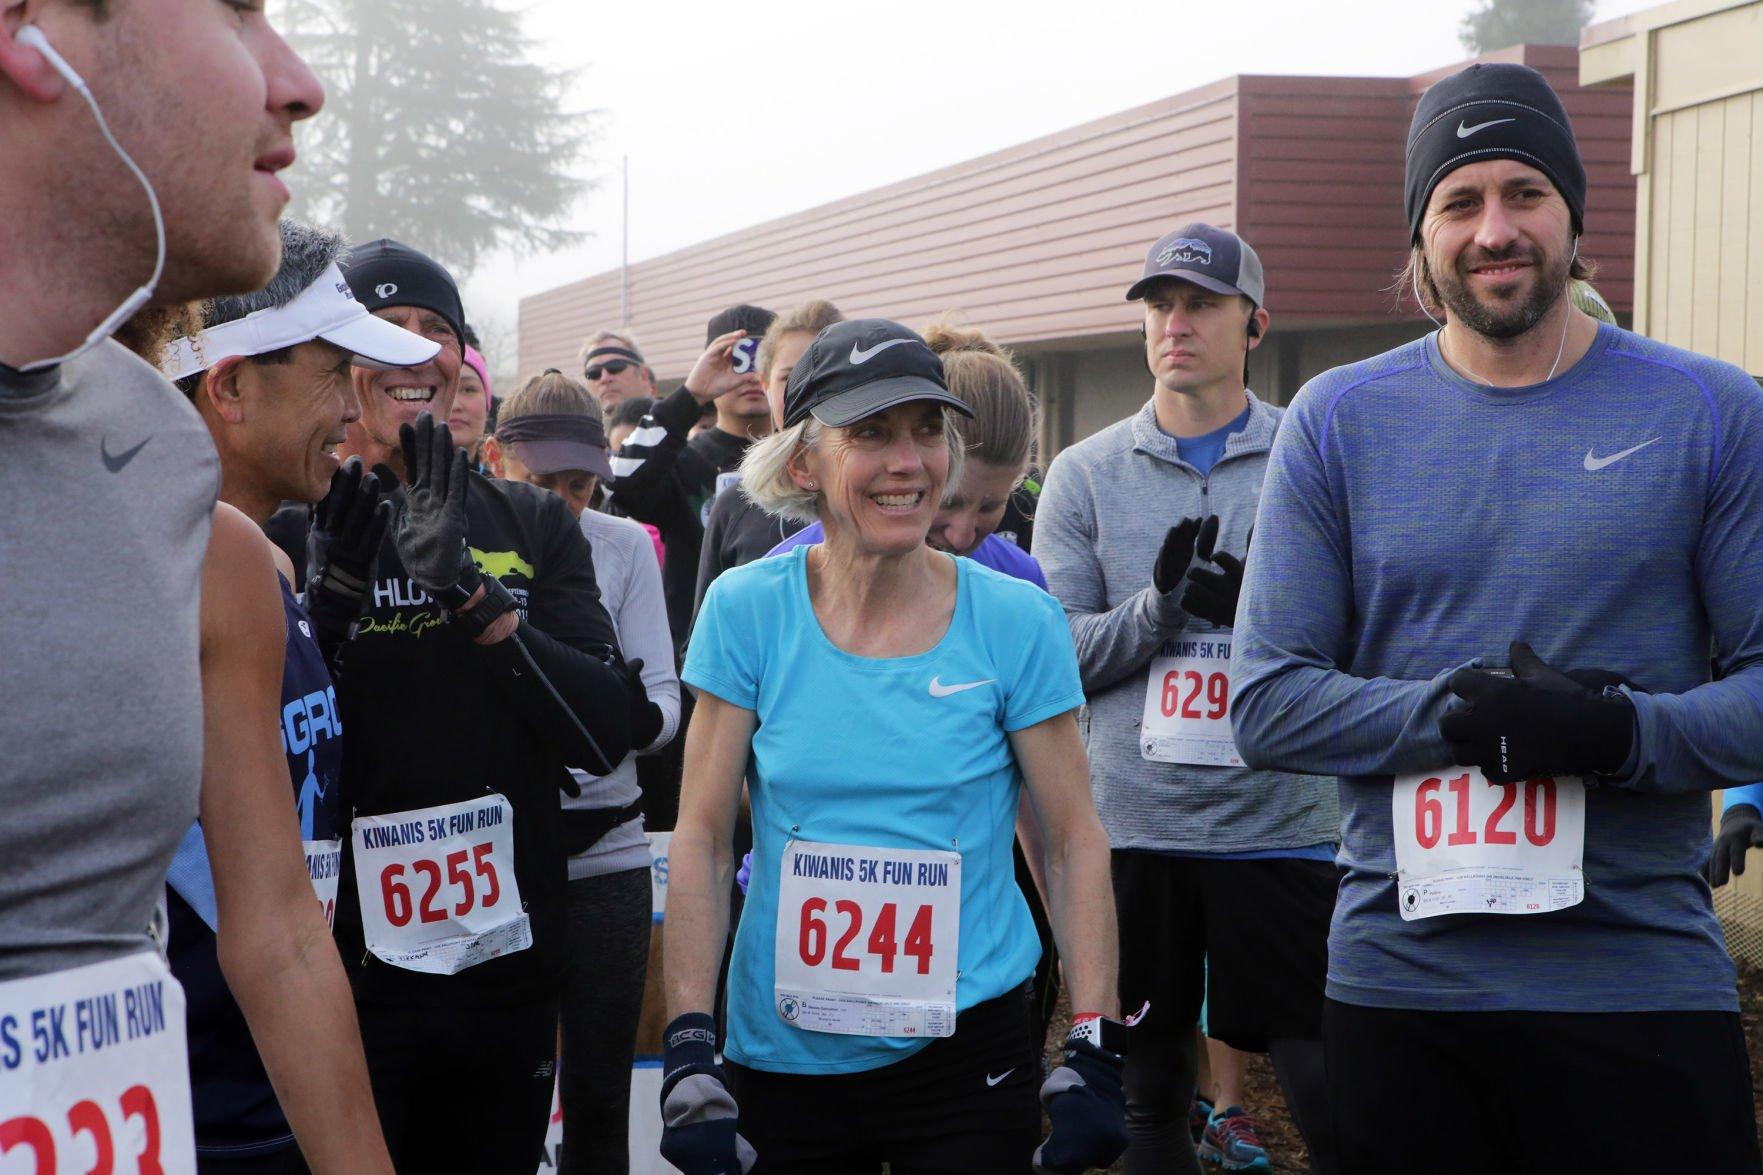 pictures Joan Benoit Samuelson Olympic medal in marathon running